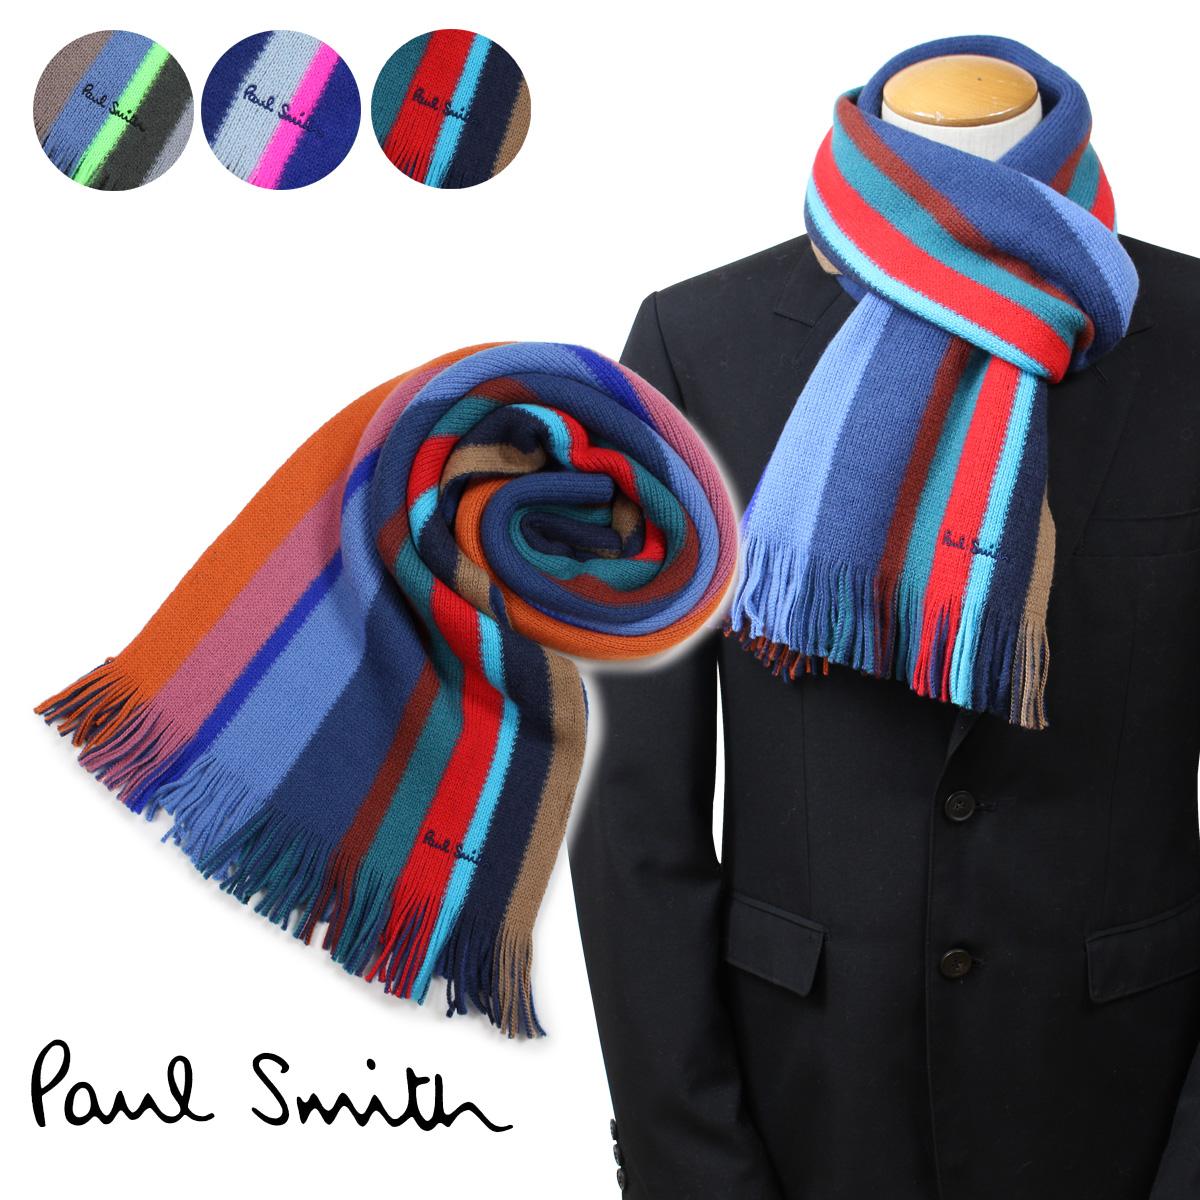 Paul Smith ポールスミス マフラー メンズ ウール マルチカラー 355E-AS10